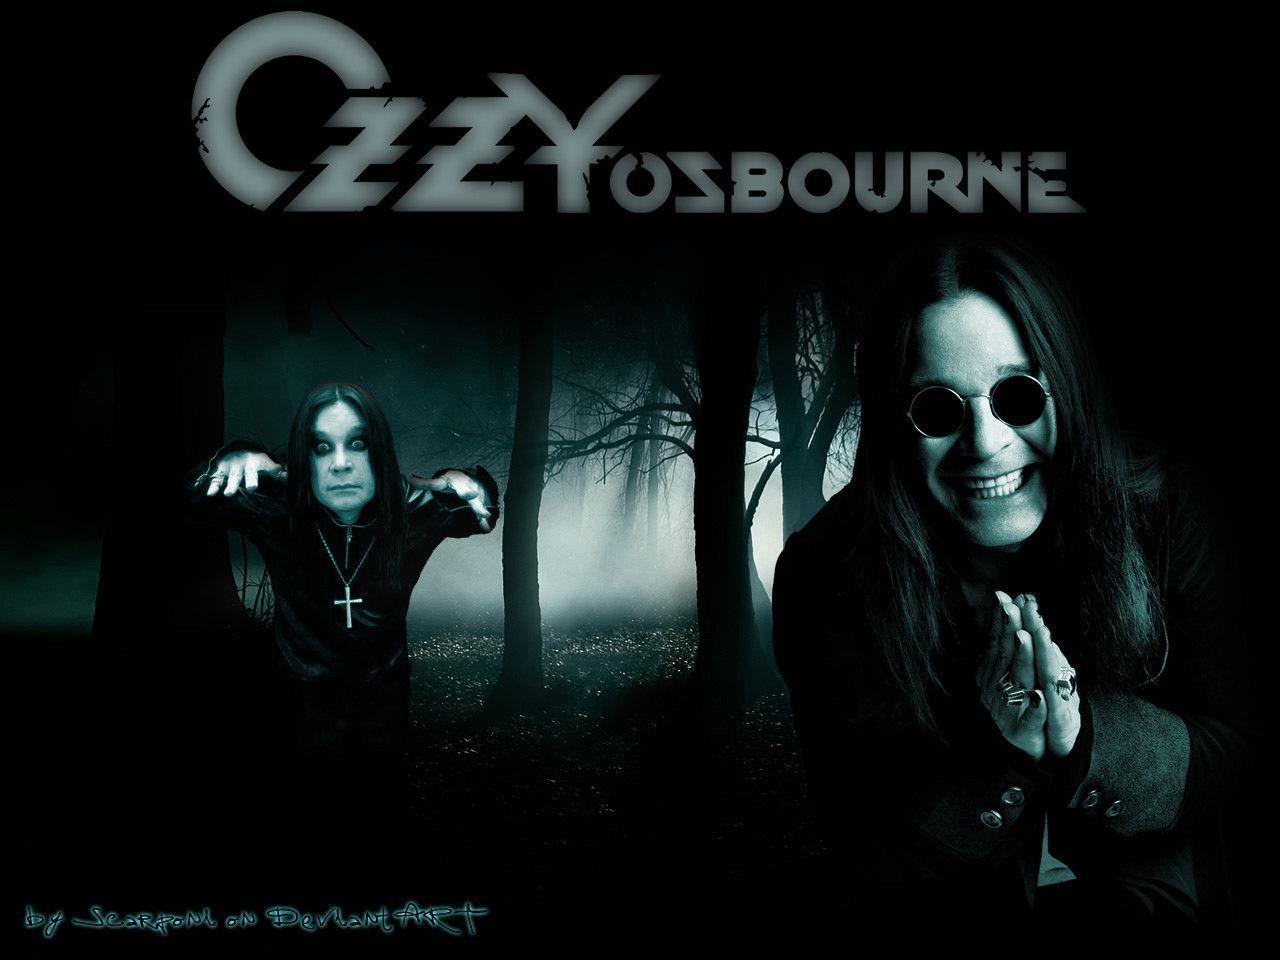 Ozzy Osbourne Wallpapers Top Free Ozzy Osbourne